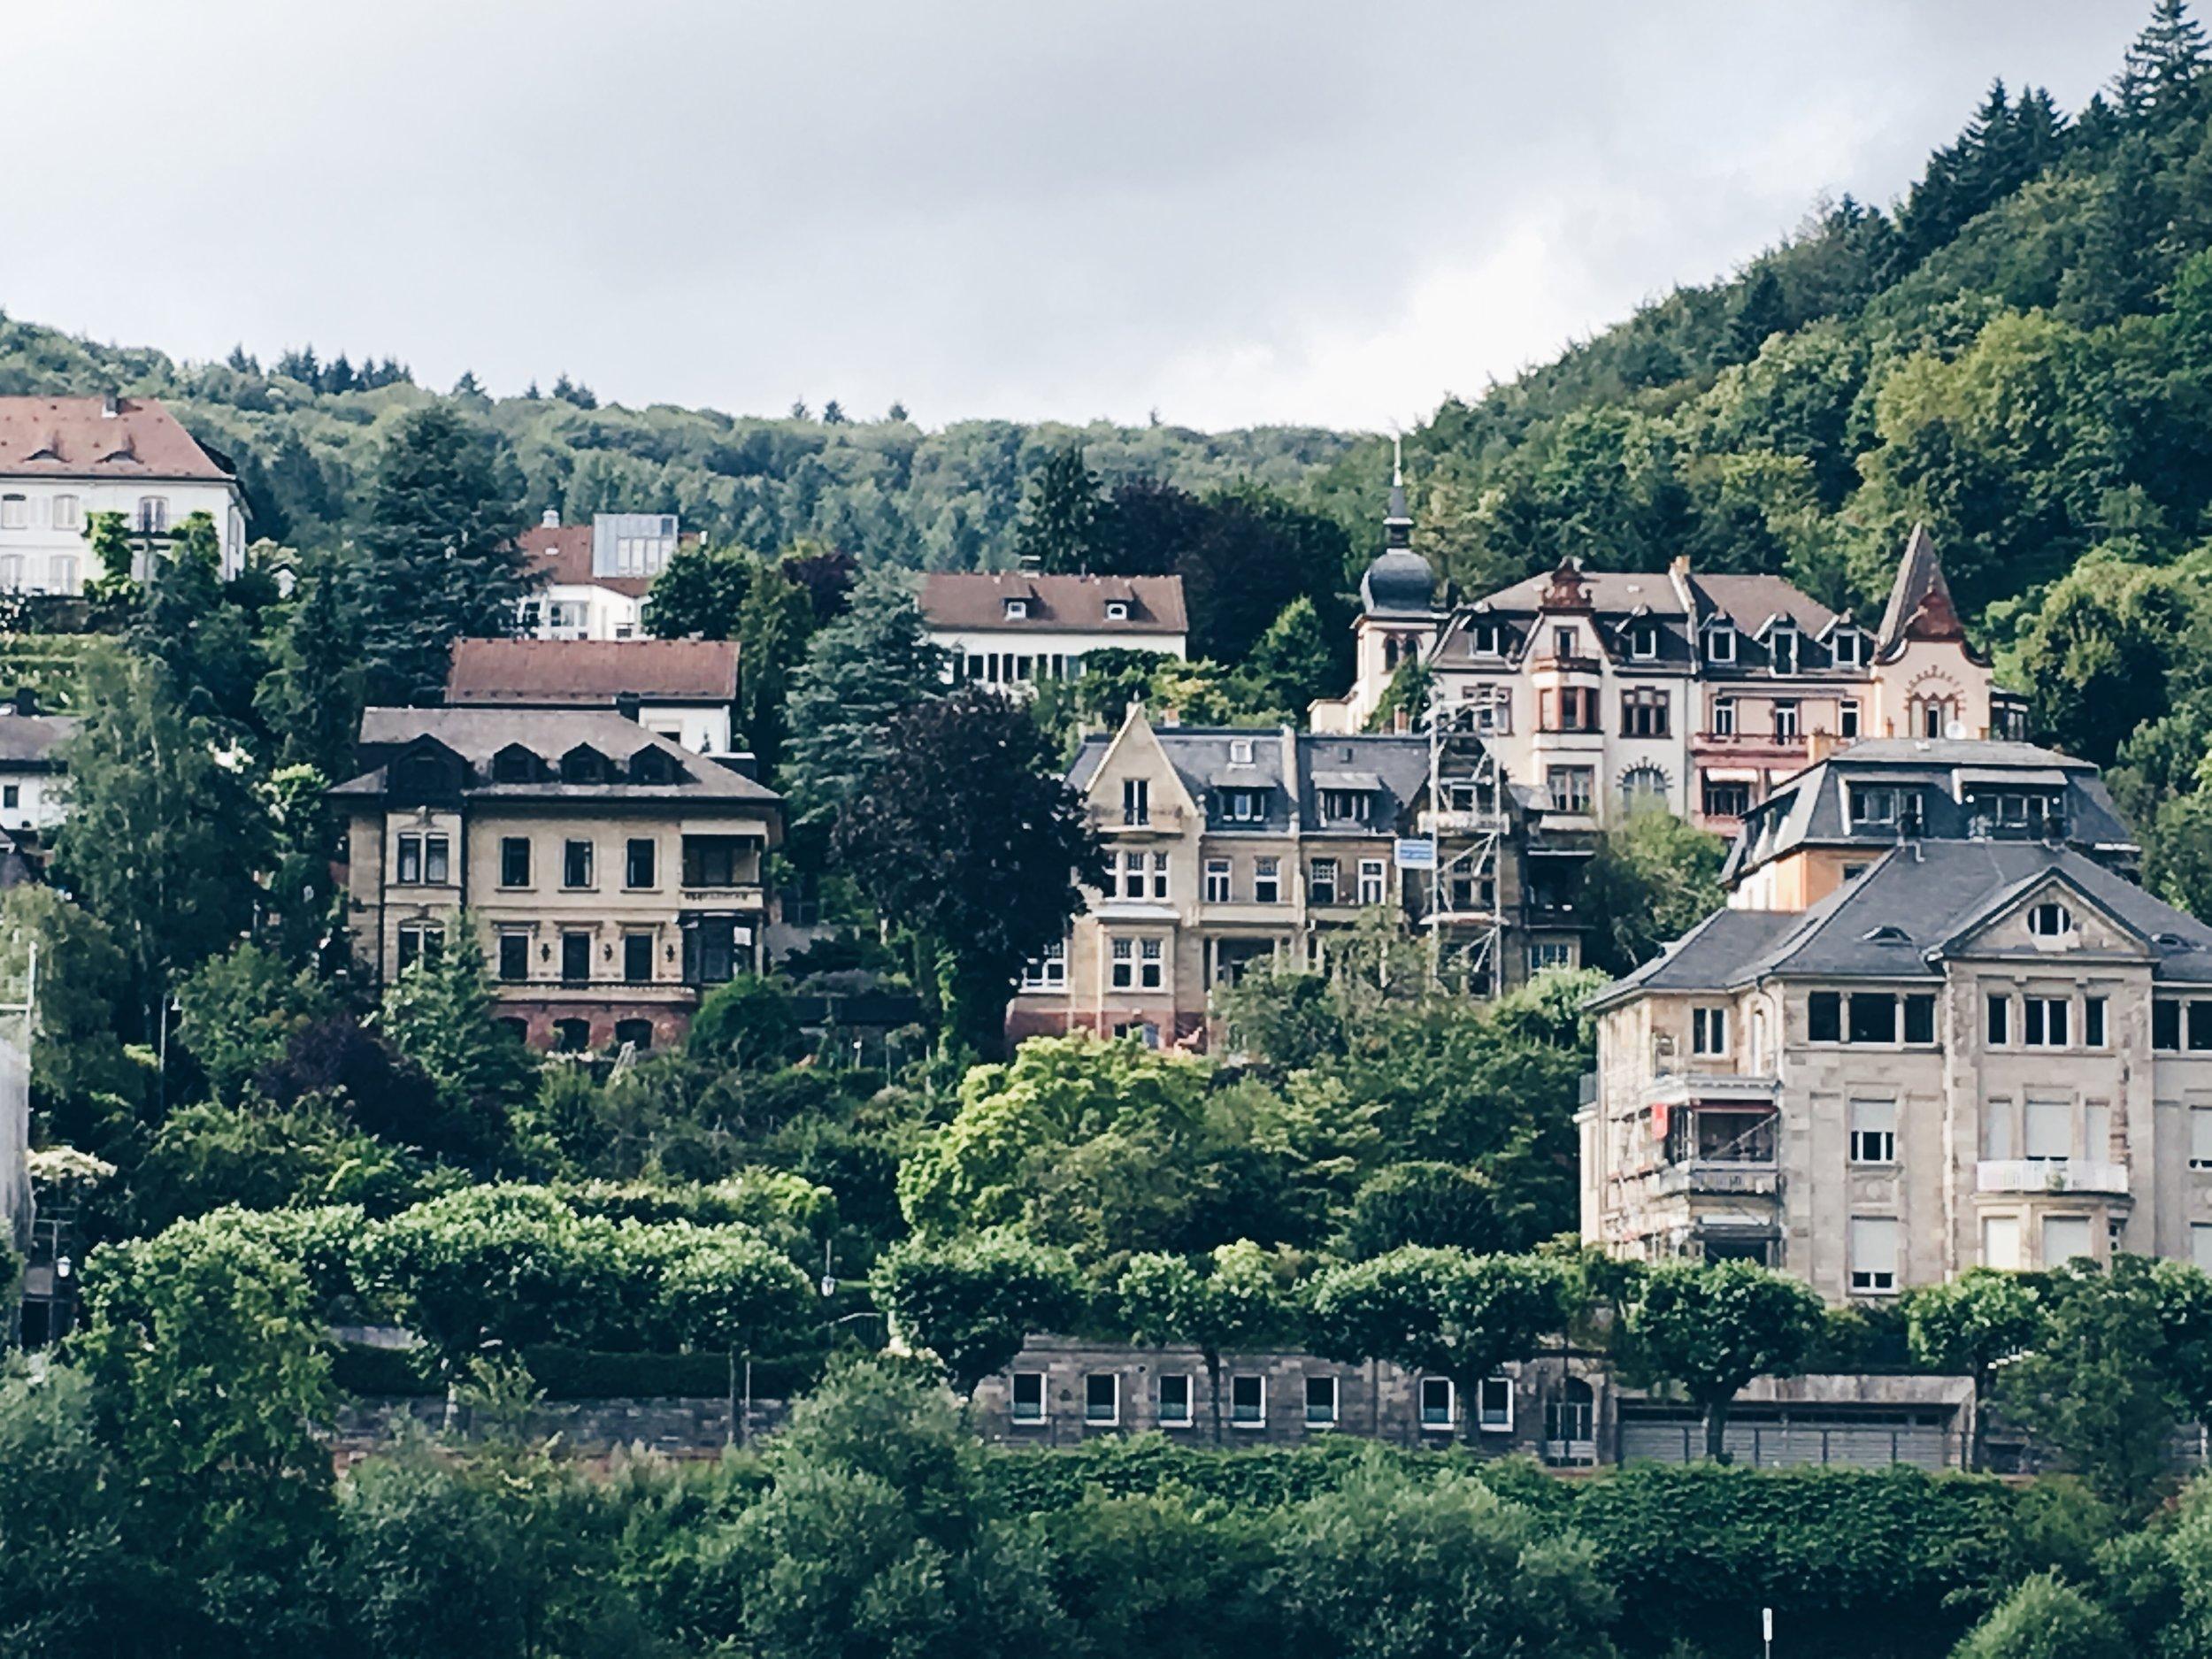 City of Heidelberg